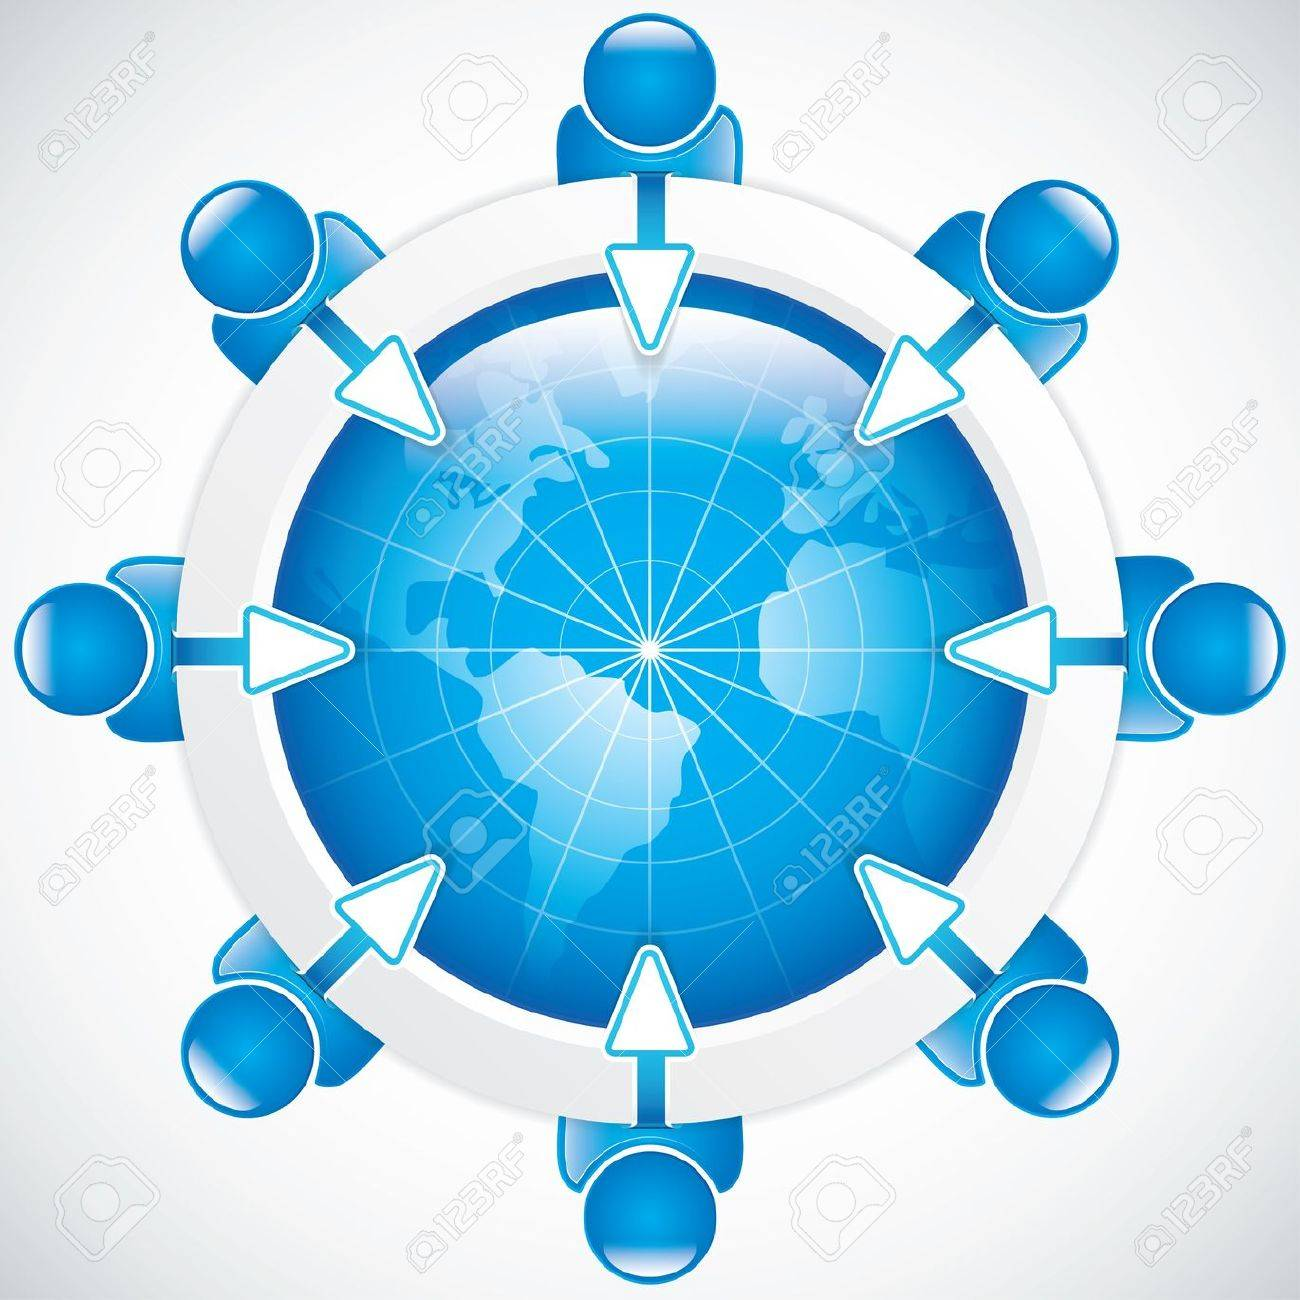 Teamwork around the table Business vector Stock Vector - 15046071